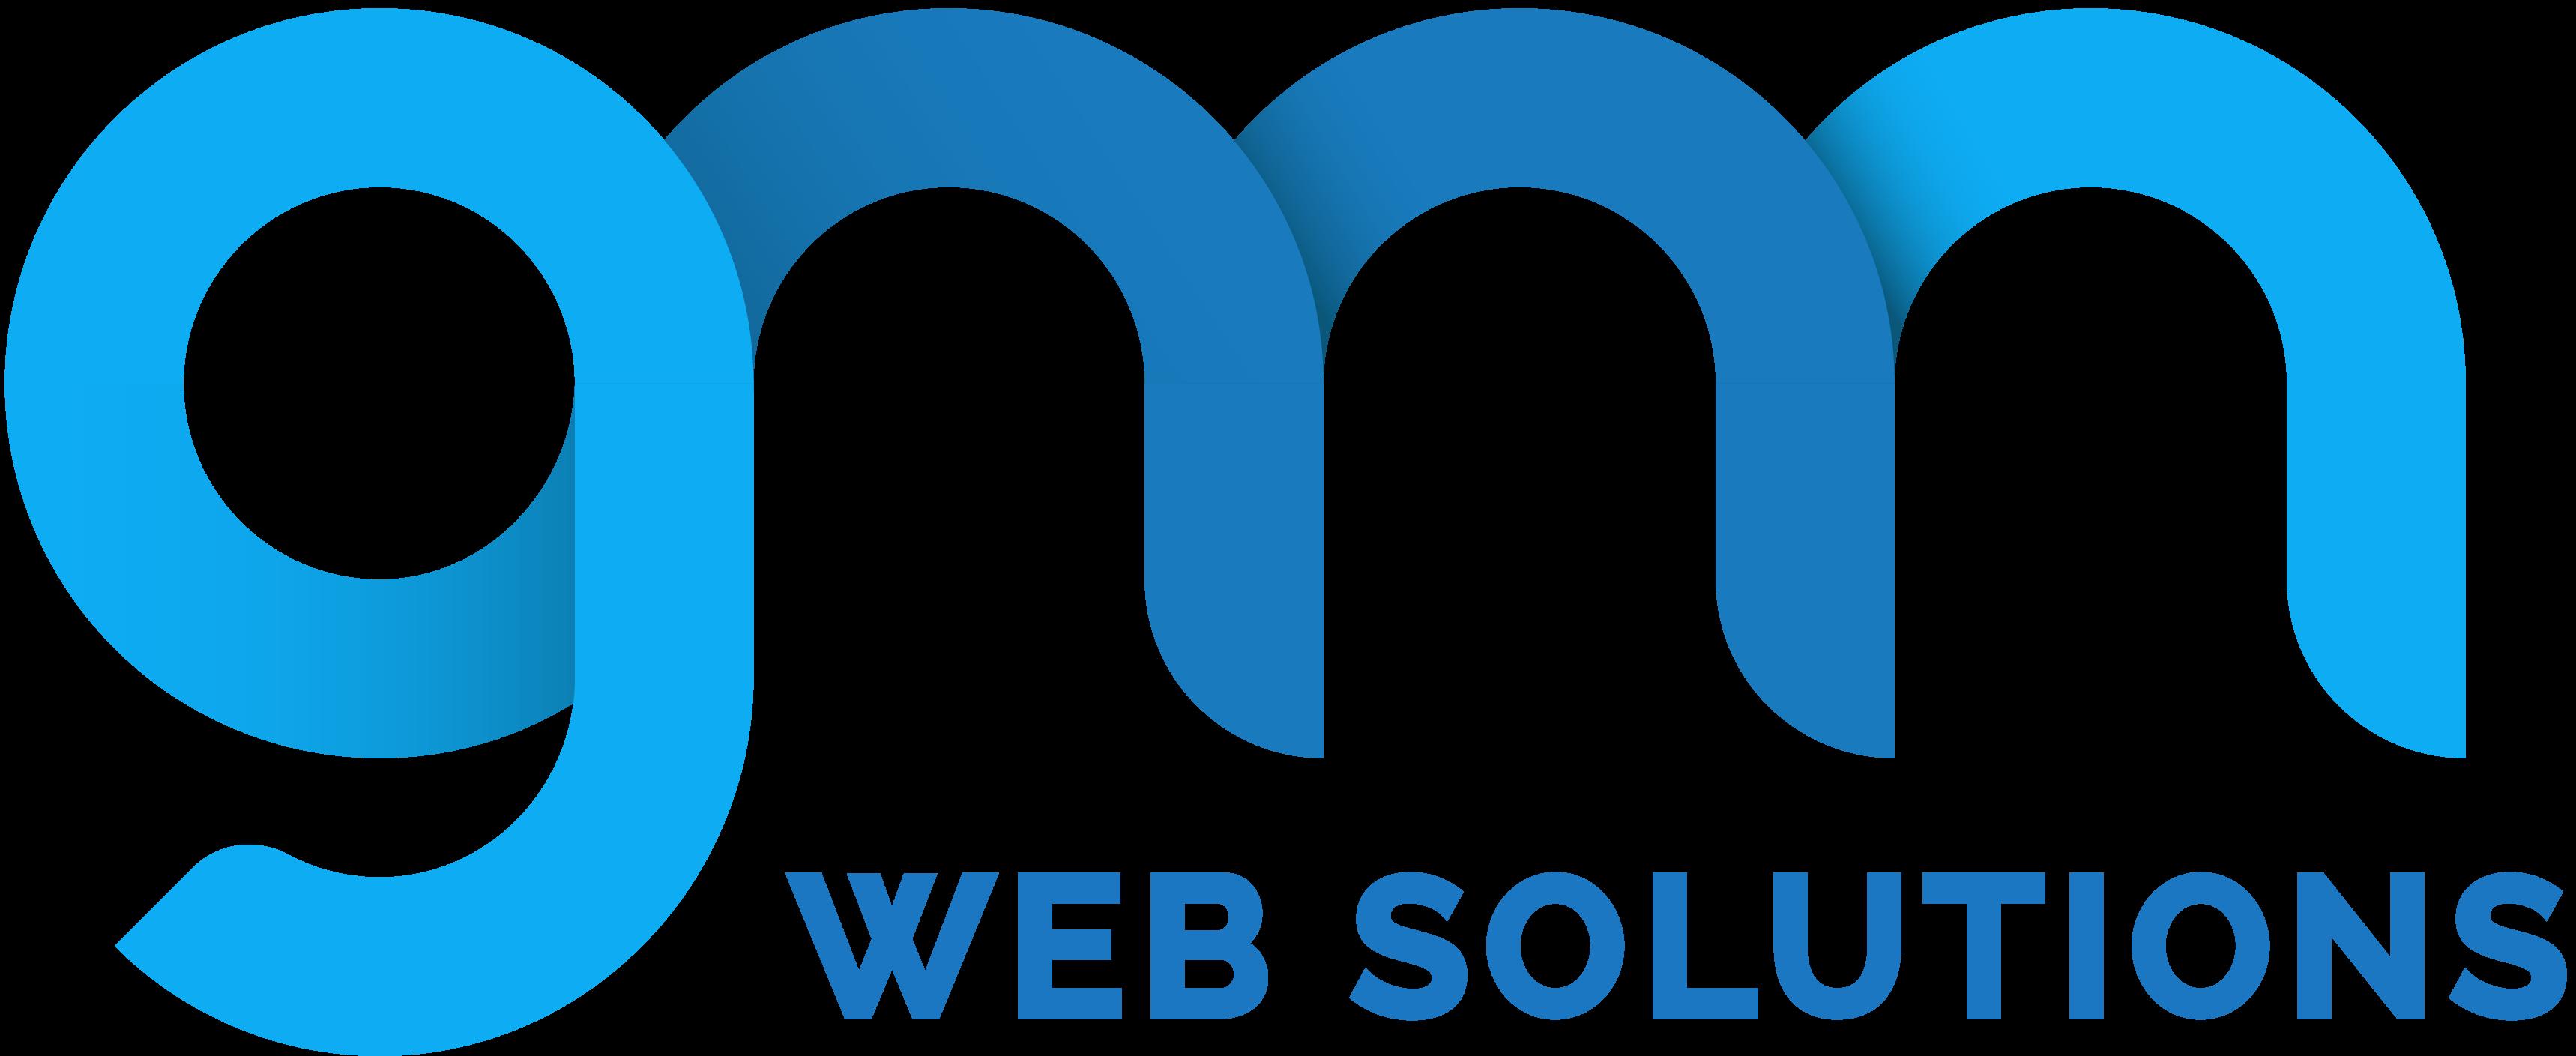 Gmnwebsolutions